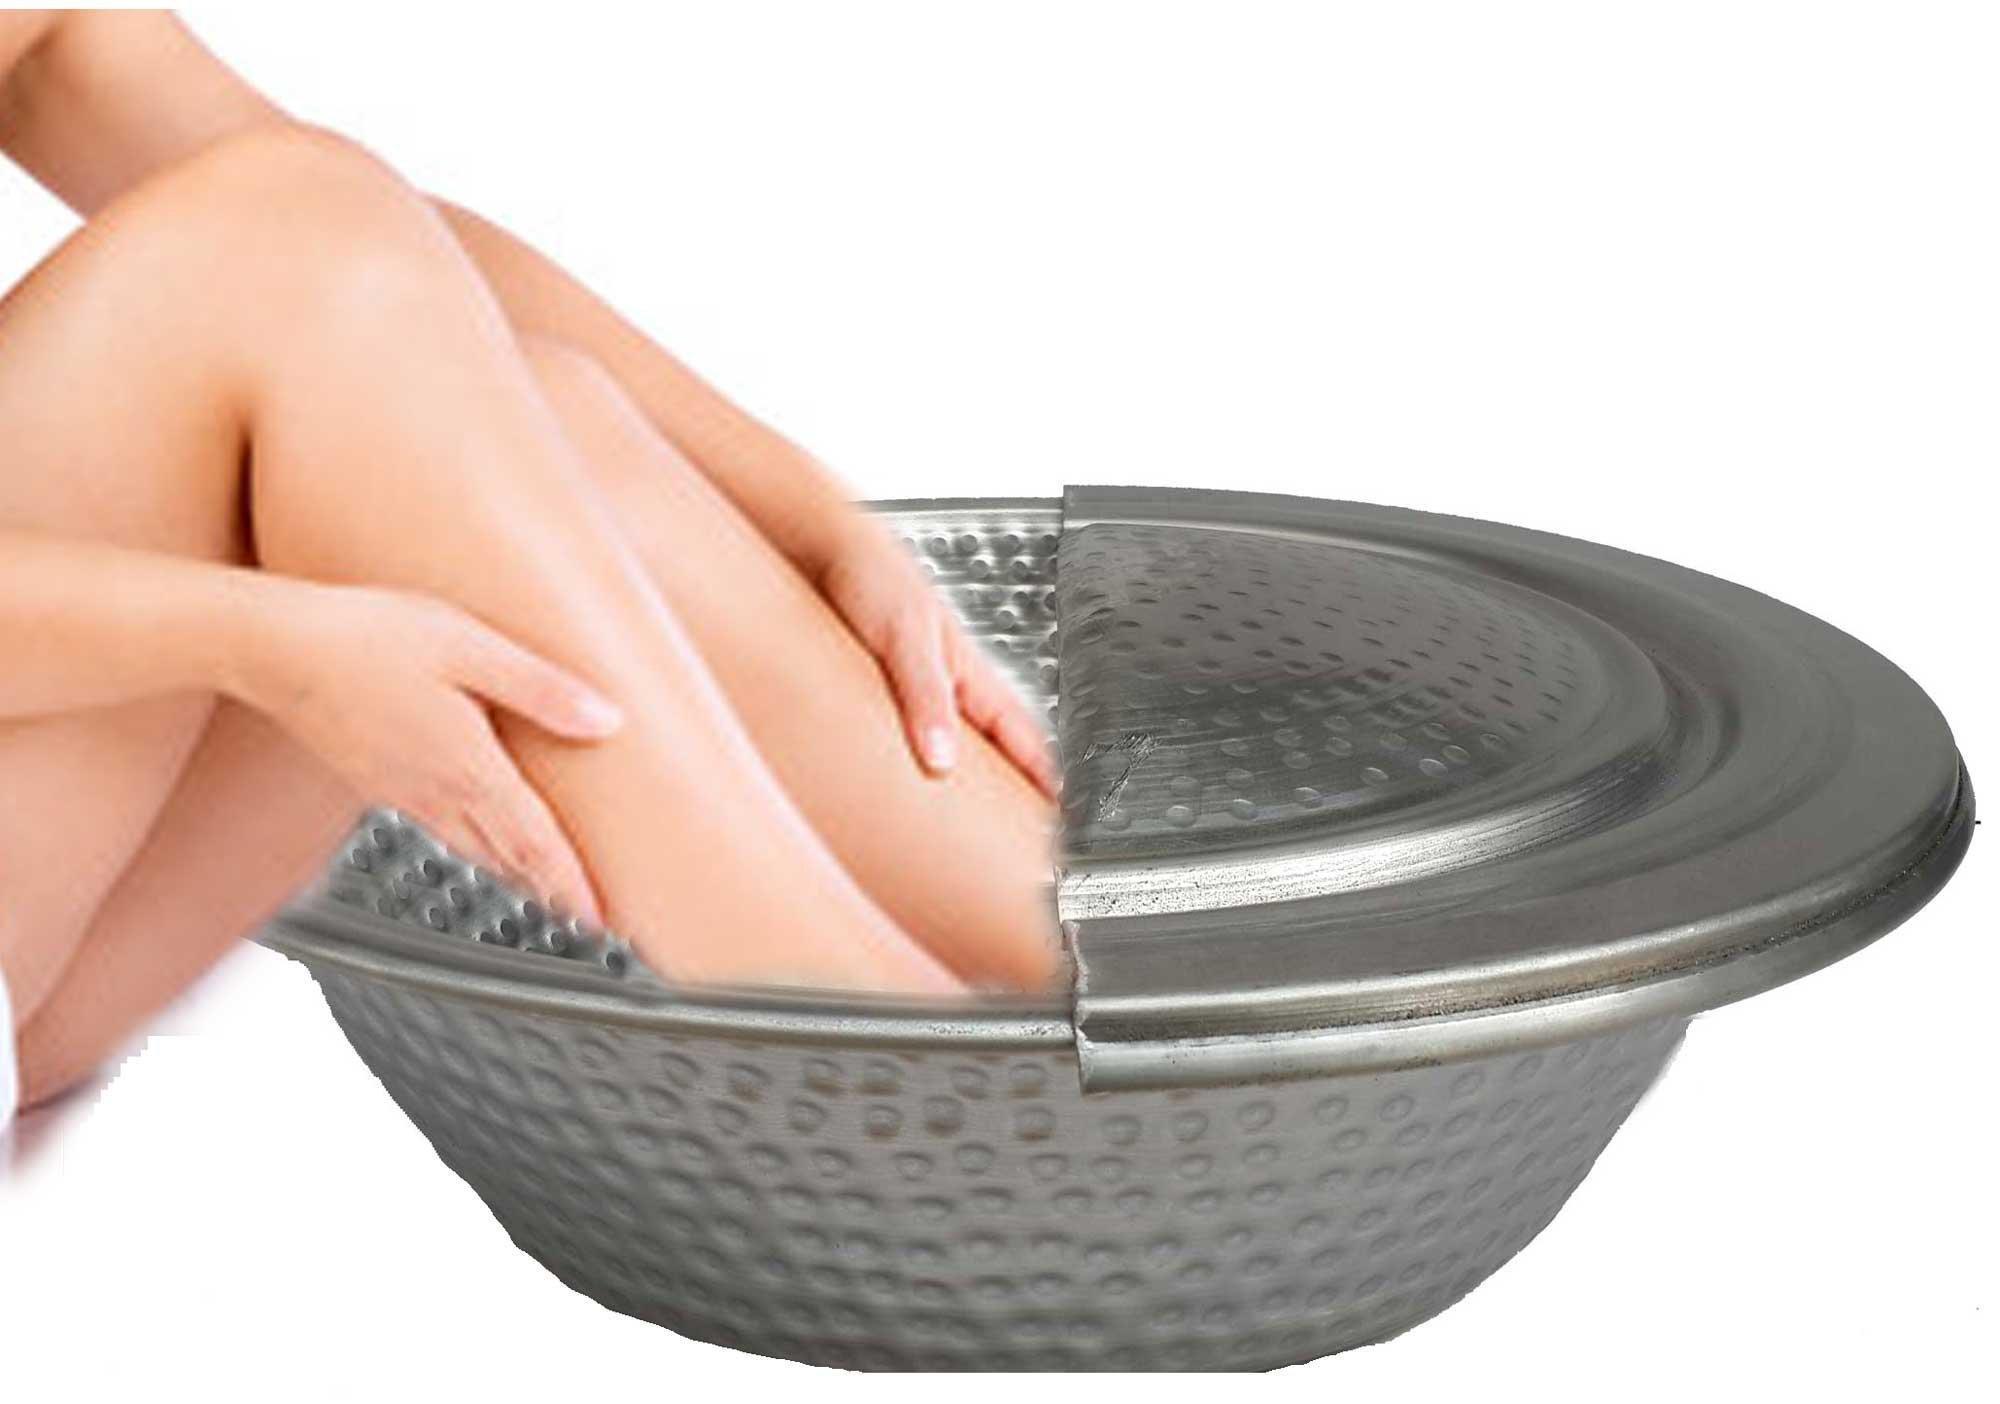 Egypt gift shops Light Nickel Pedicure Spa Massage Leg Bath Soaking Wash Massage Bowl Basin Skin Care Bride Cosmetic Wellness Foot Rest